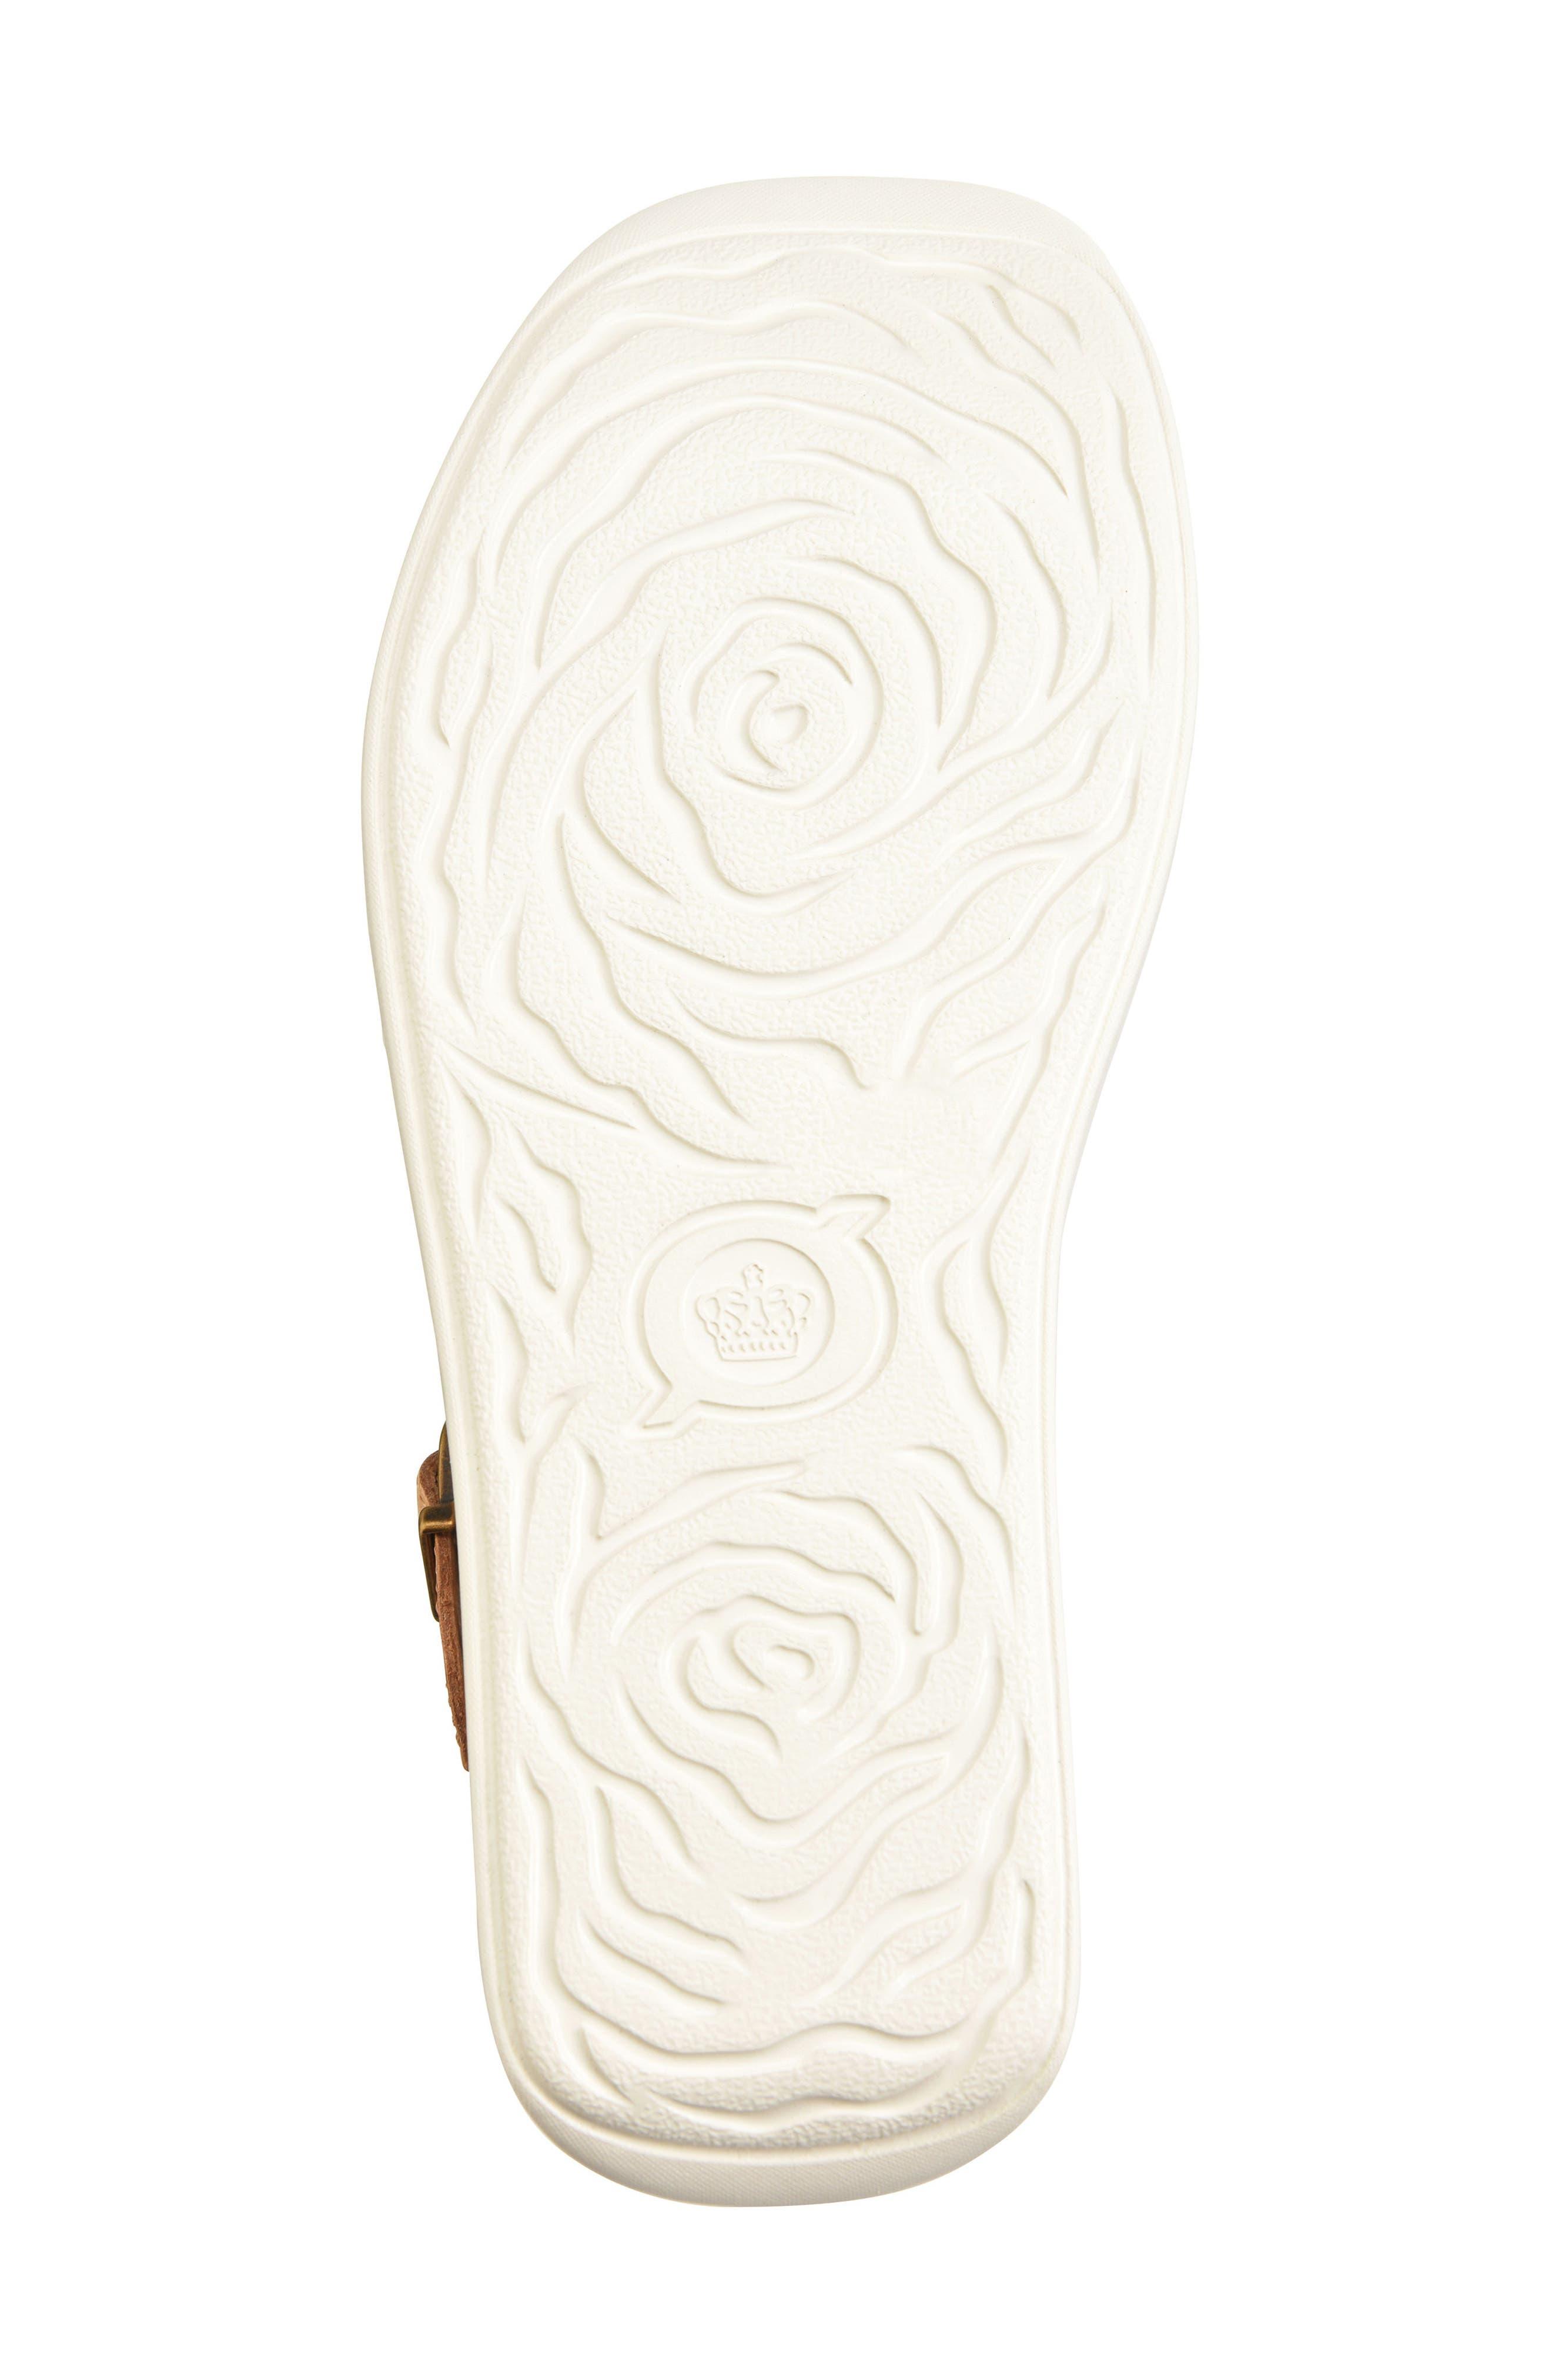 Breaker Platform Sandal,                             Alternate thumbnail 6, color,                             Light Blue/ Tan Leather